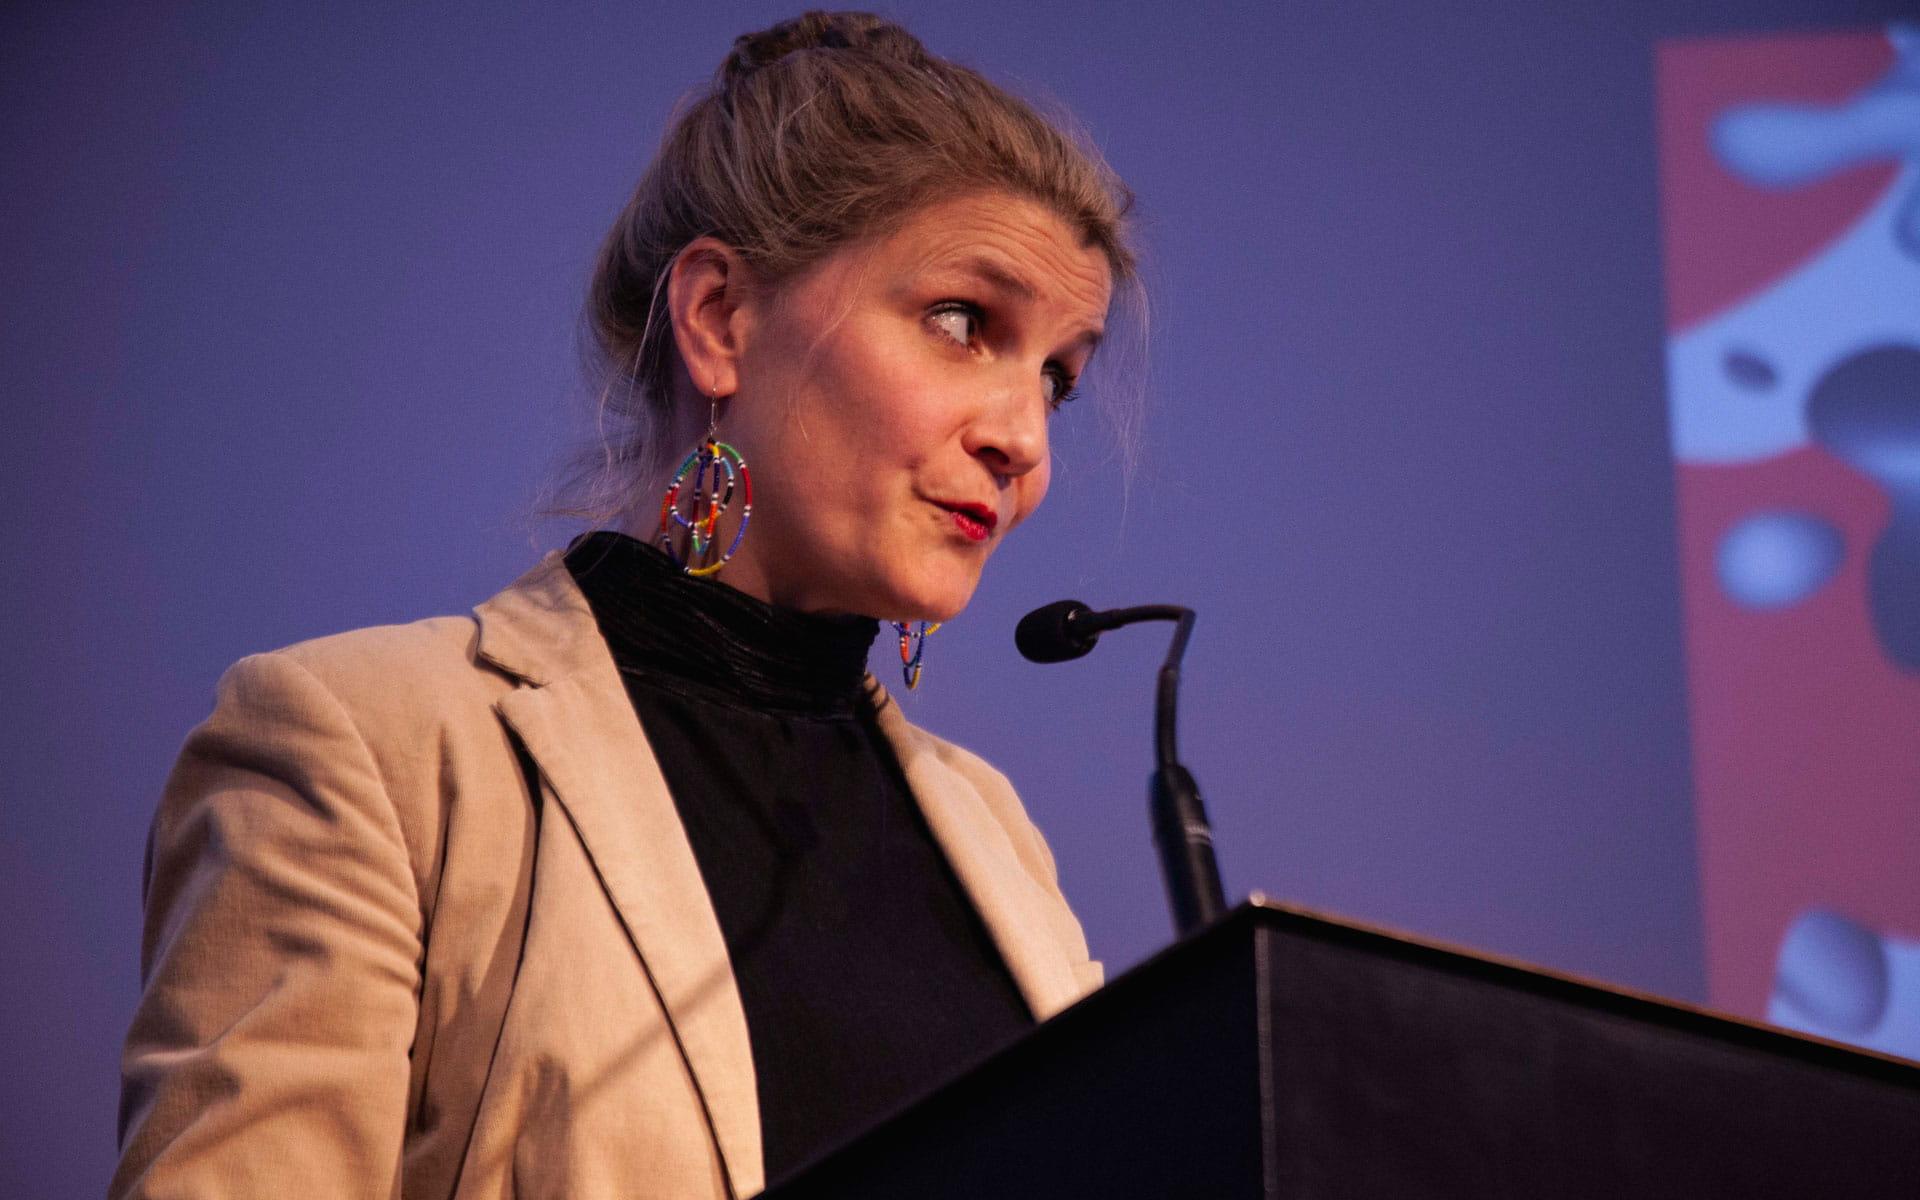 Aleya Kassam, Ketty Nivyabandi, Jean-Luc Raharimanana, Lisa Tuyala: Performative Eröffnung <br/>(c) Lemia Bodden